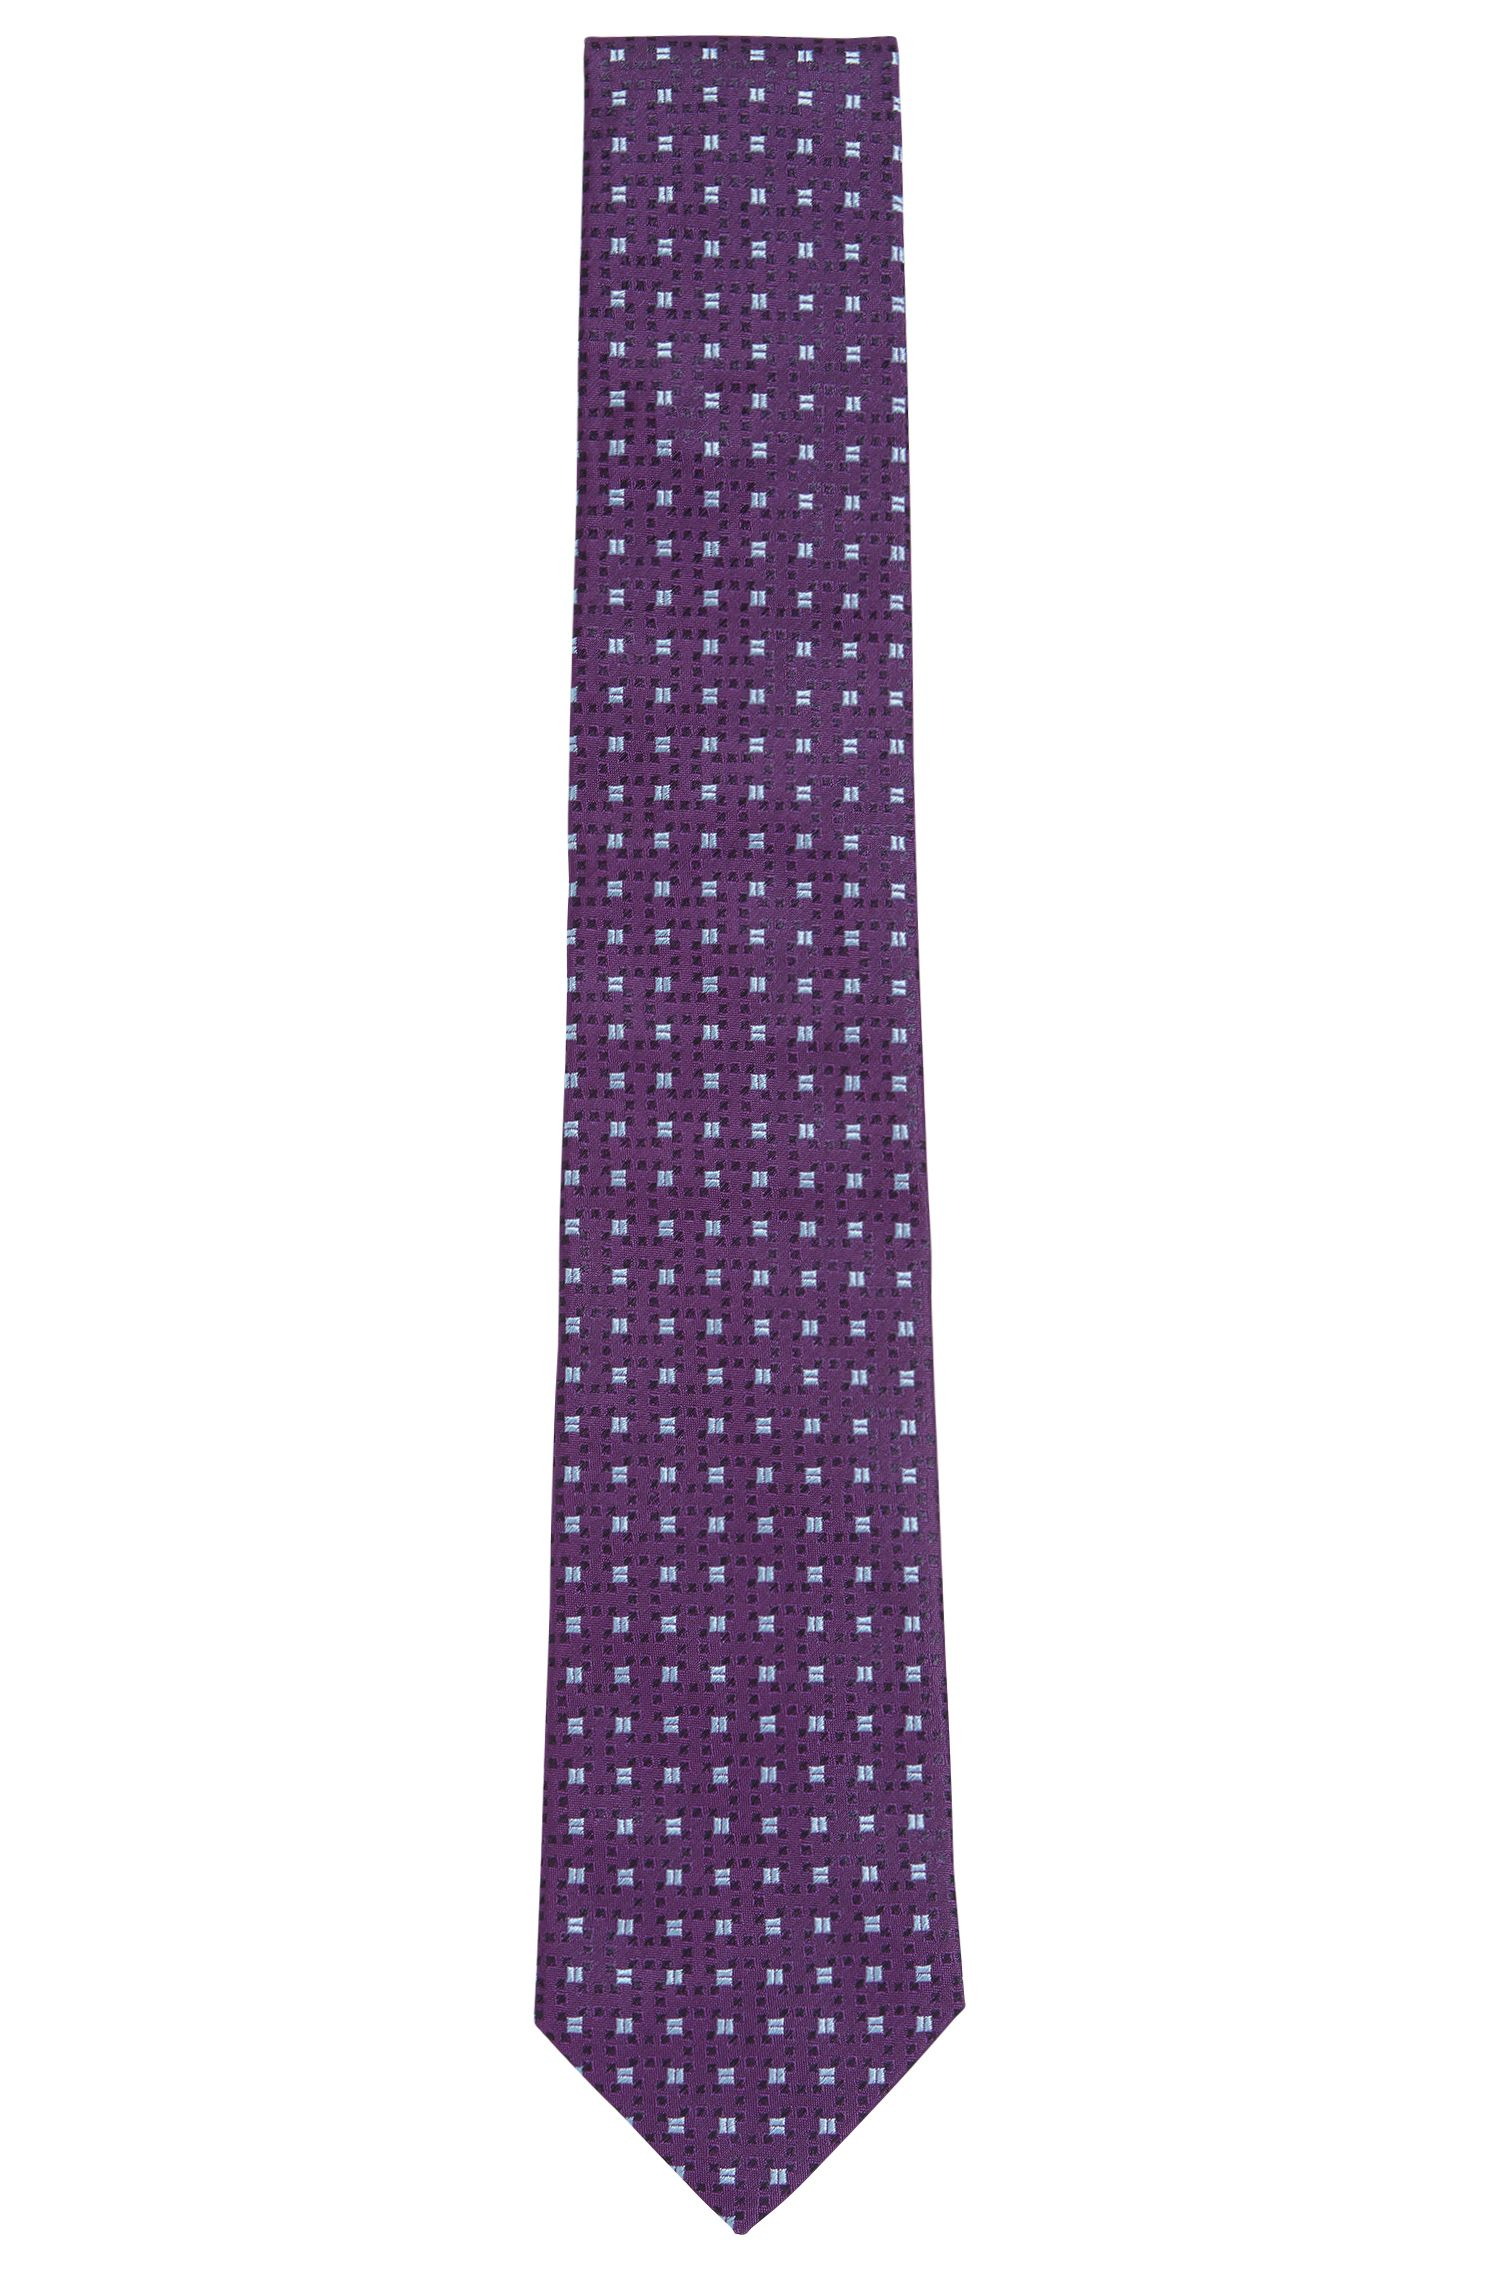 Jacquard micro-pattern tie in fine silk